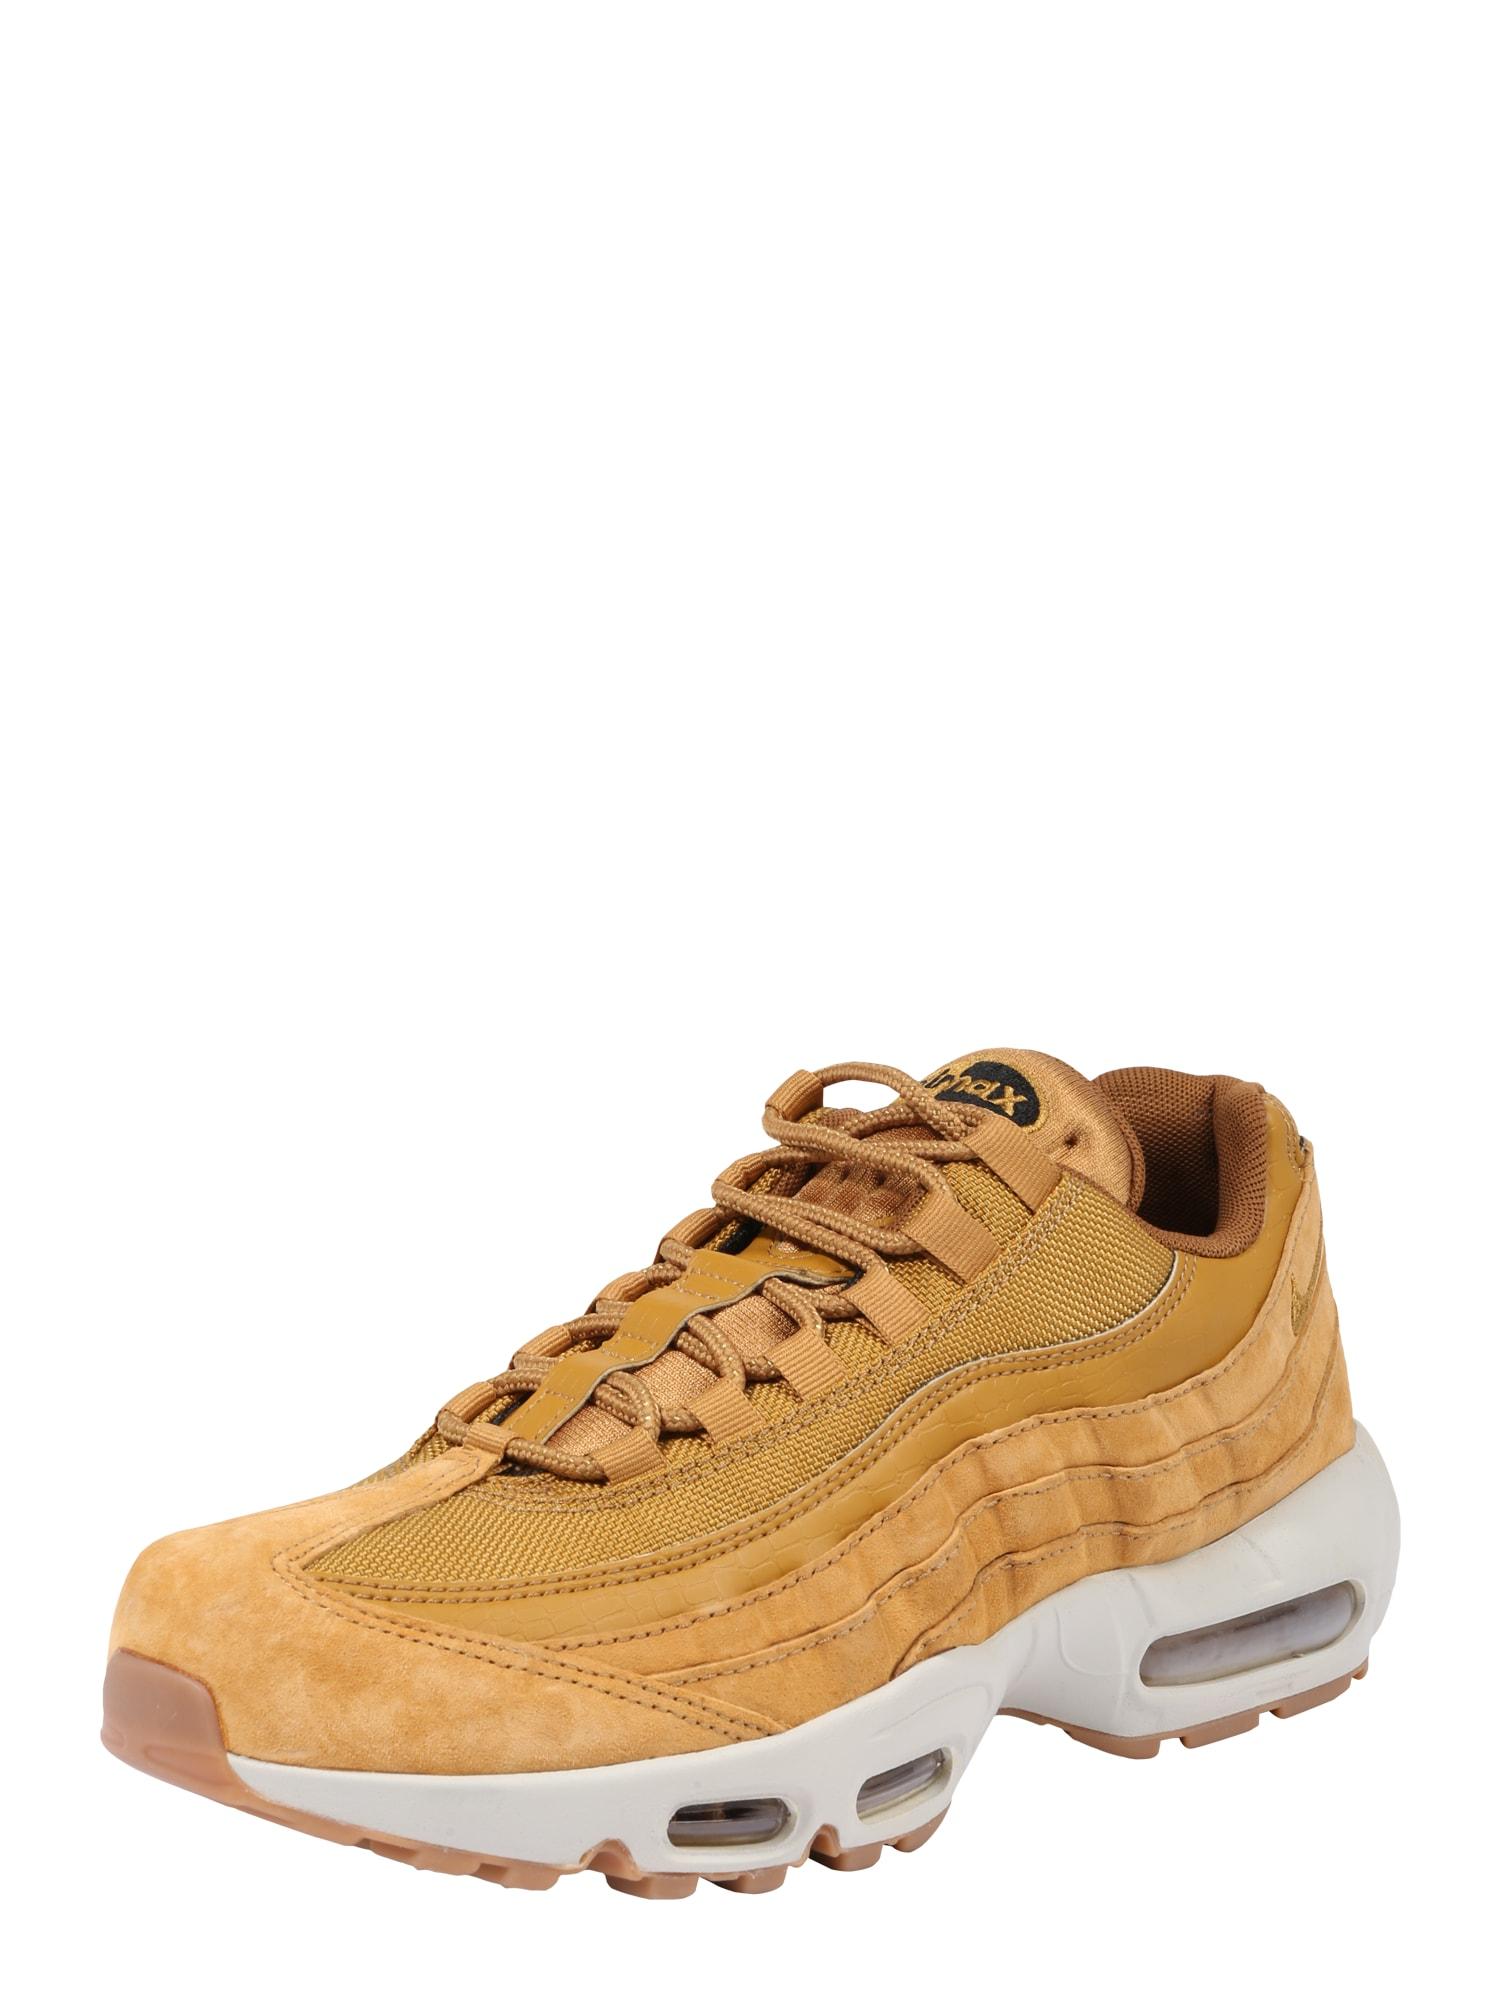 Tenisky AIR MAX 95 SE žlutá Nike Sportswear